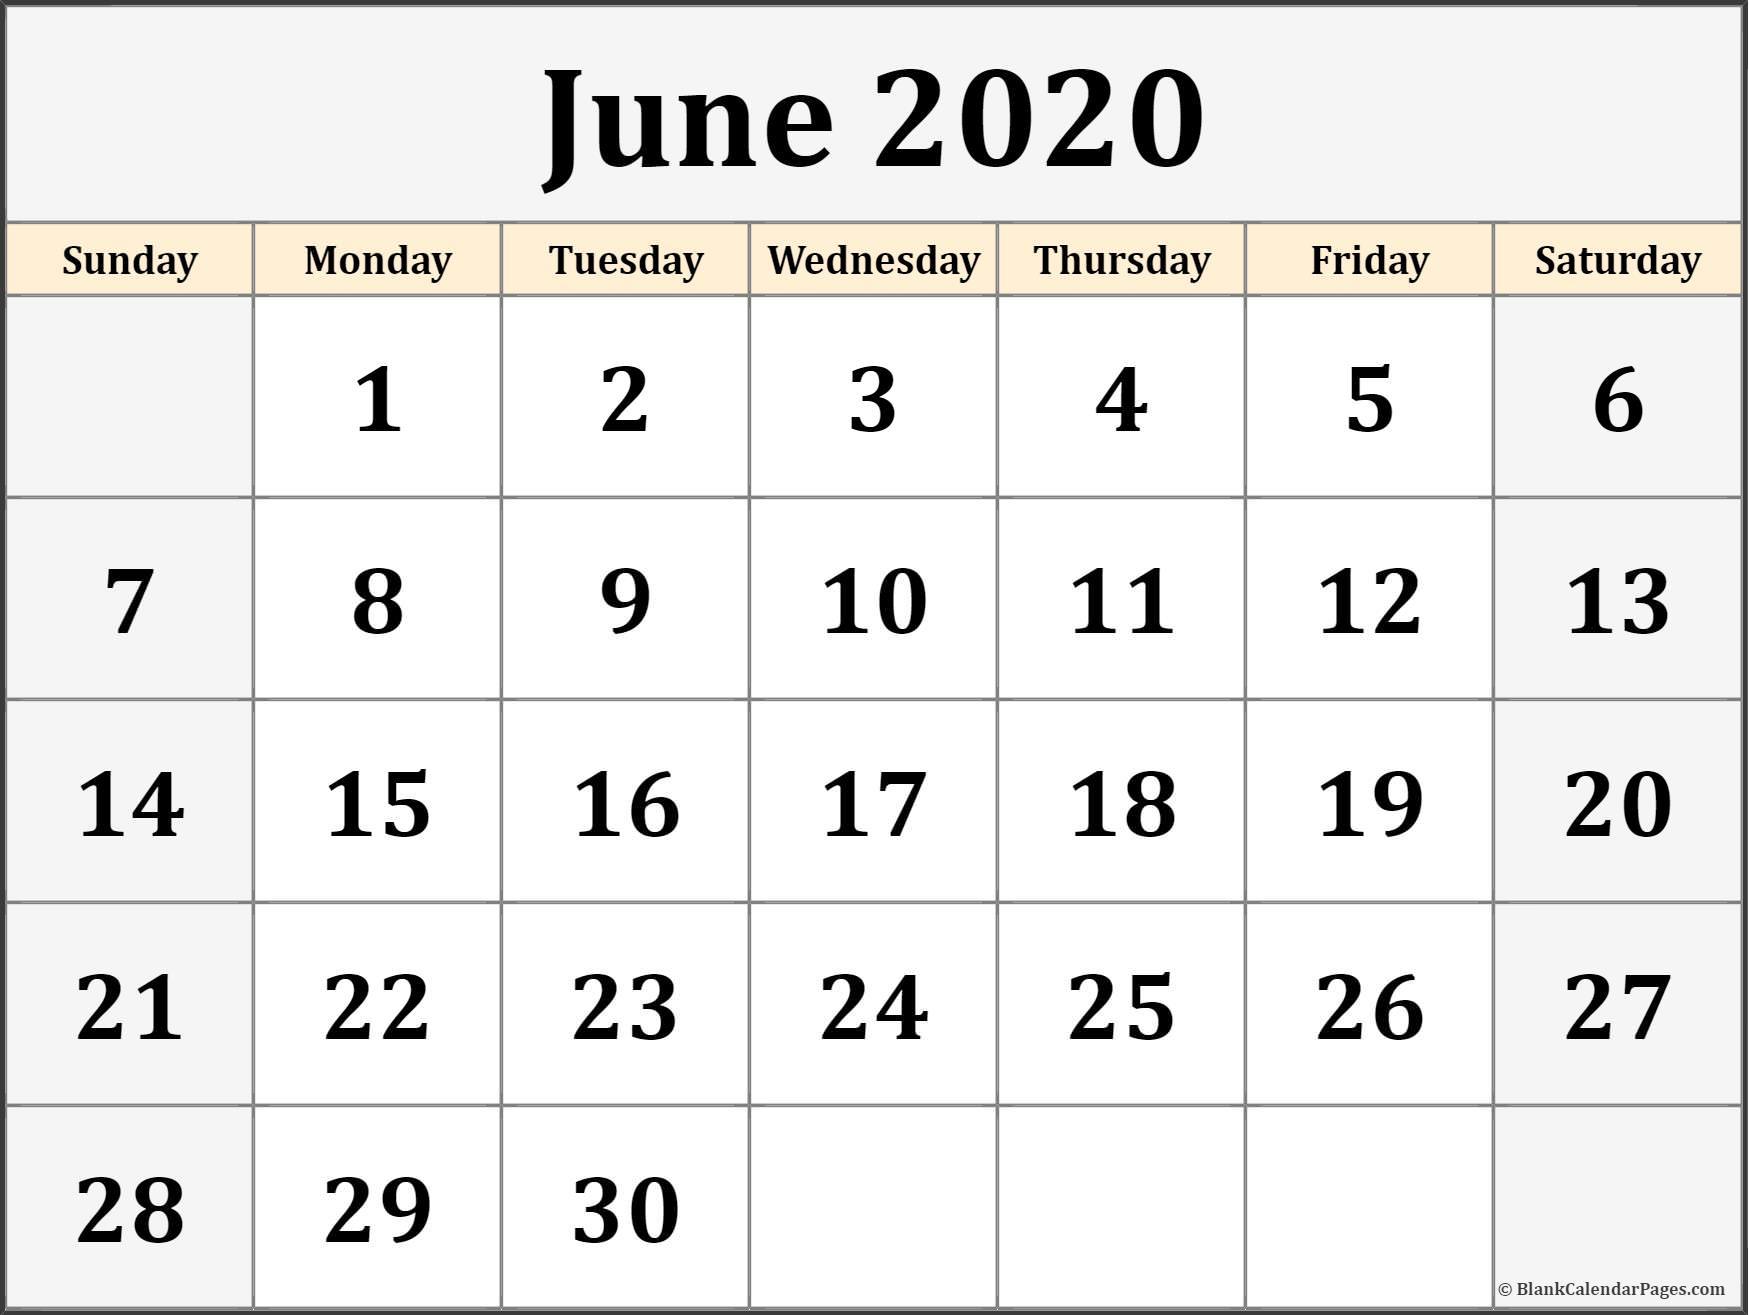 June 2020 Calendar   Free Printable Monthly Calendars